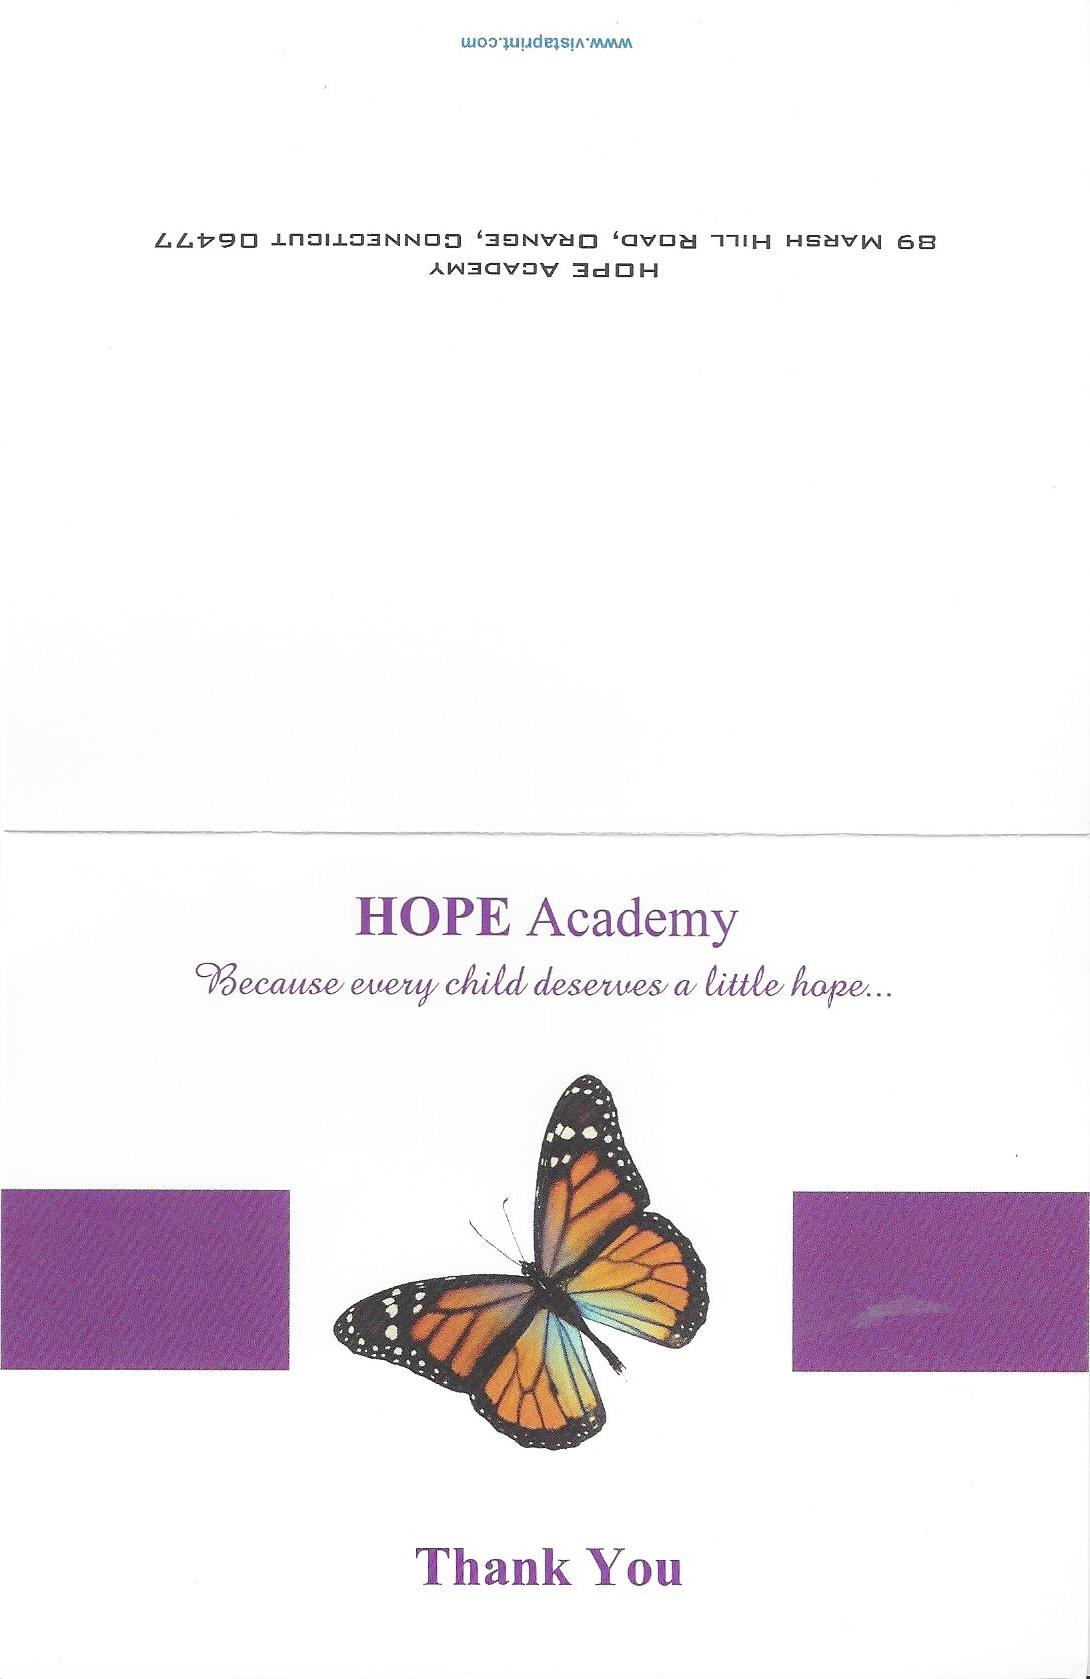 HopeAcademyThanks2.jpg